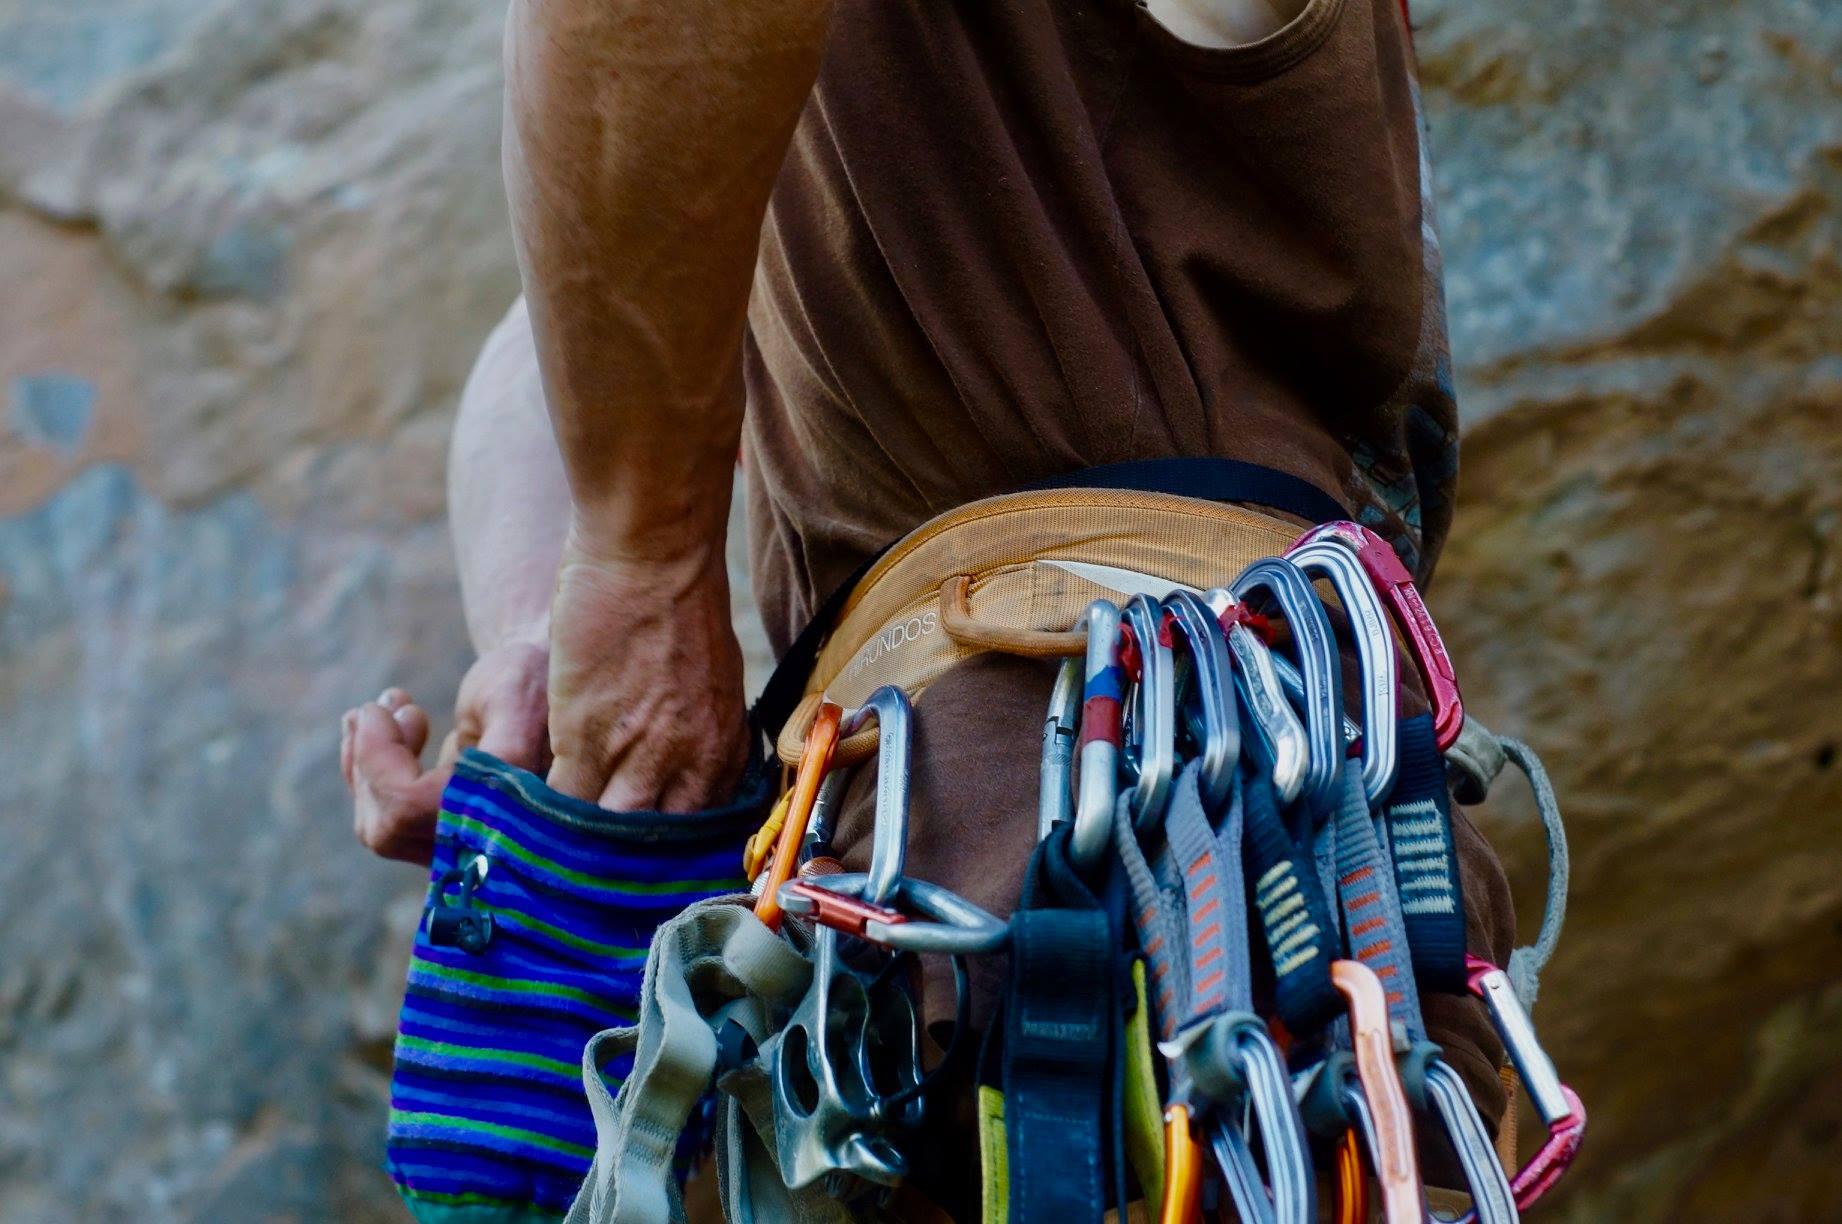 Aguacero overnight rock climbing San Cristobal Mexico00001